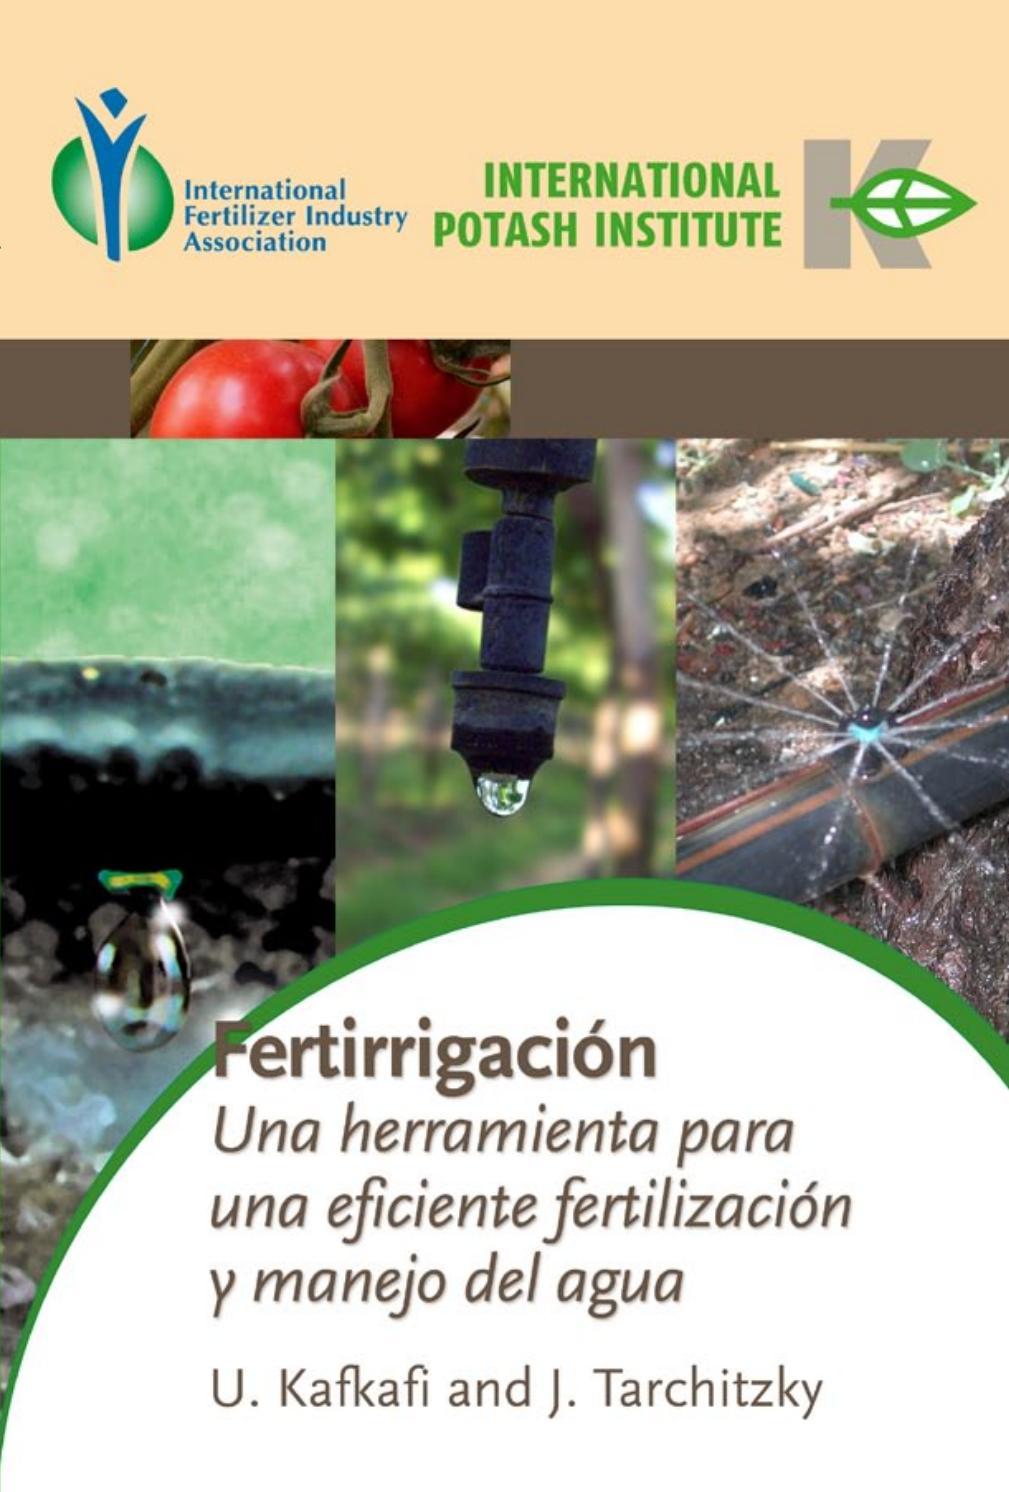 391 2012 ifa ipi fertirrigacion by consorciomav - issuu